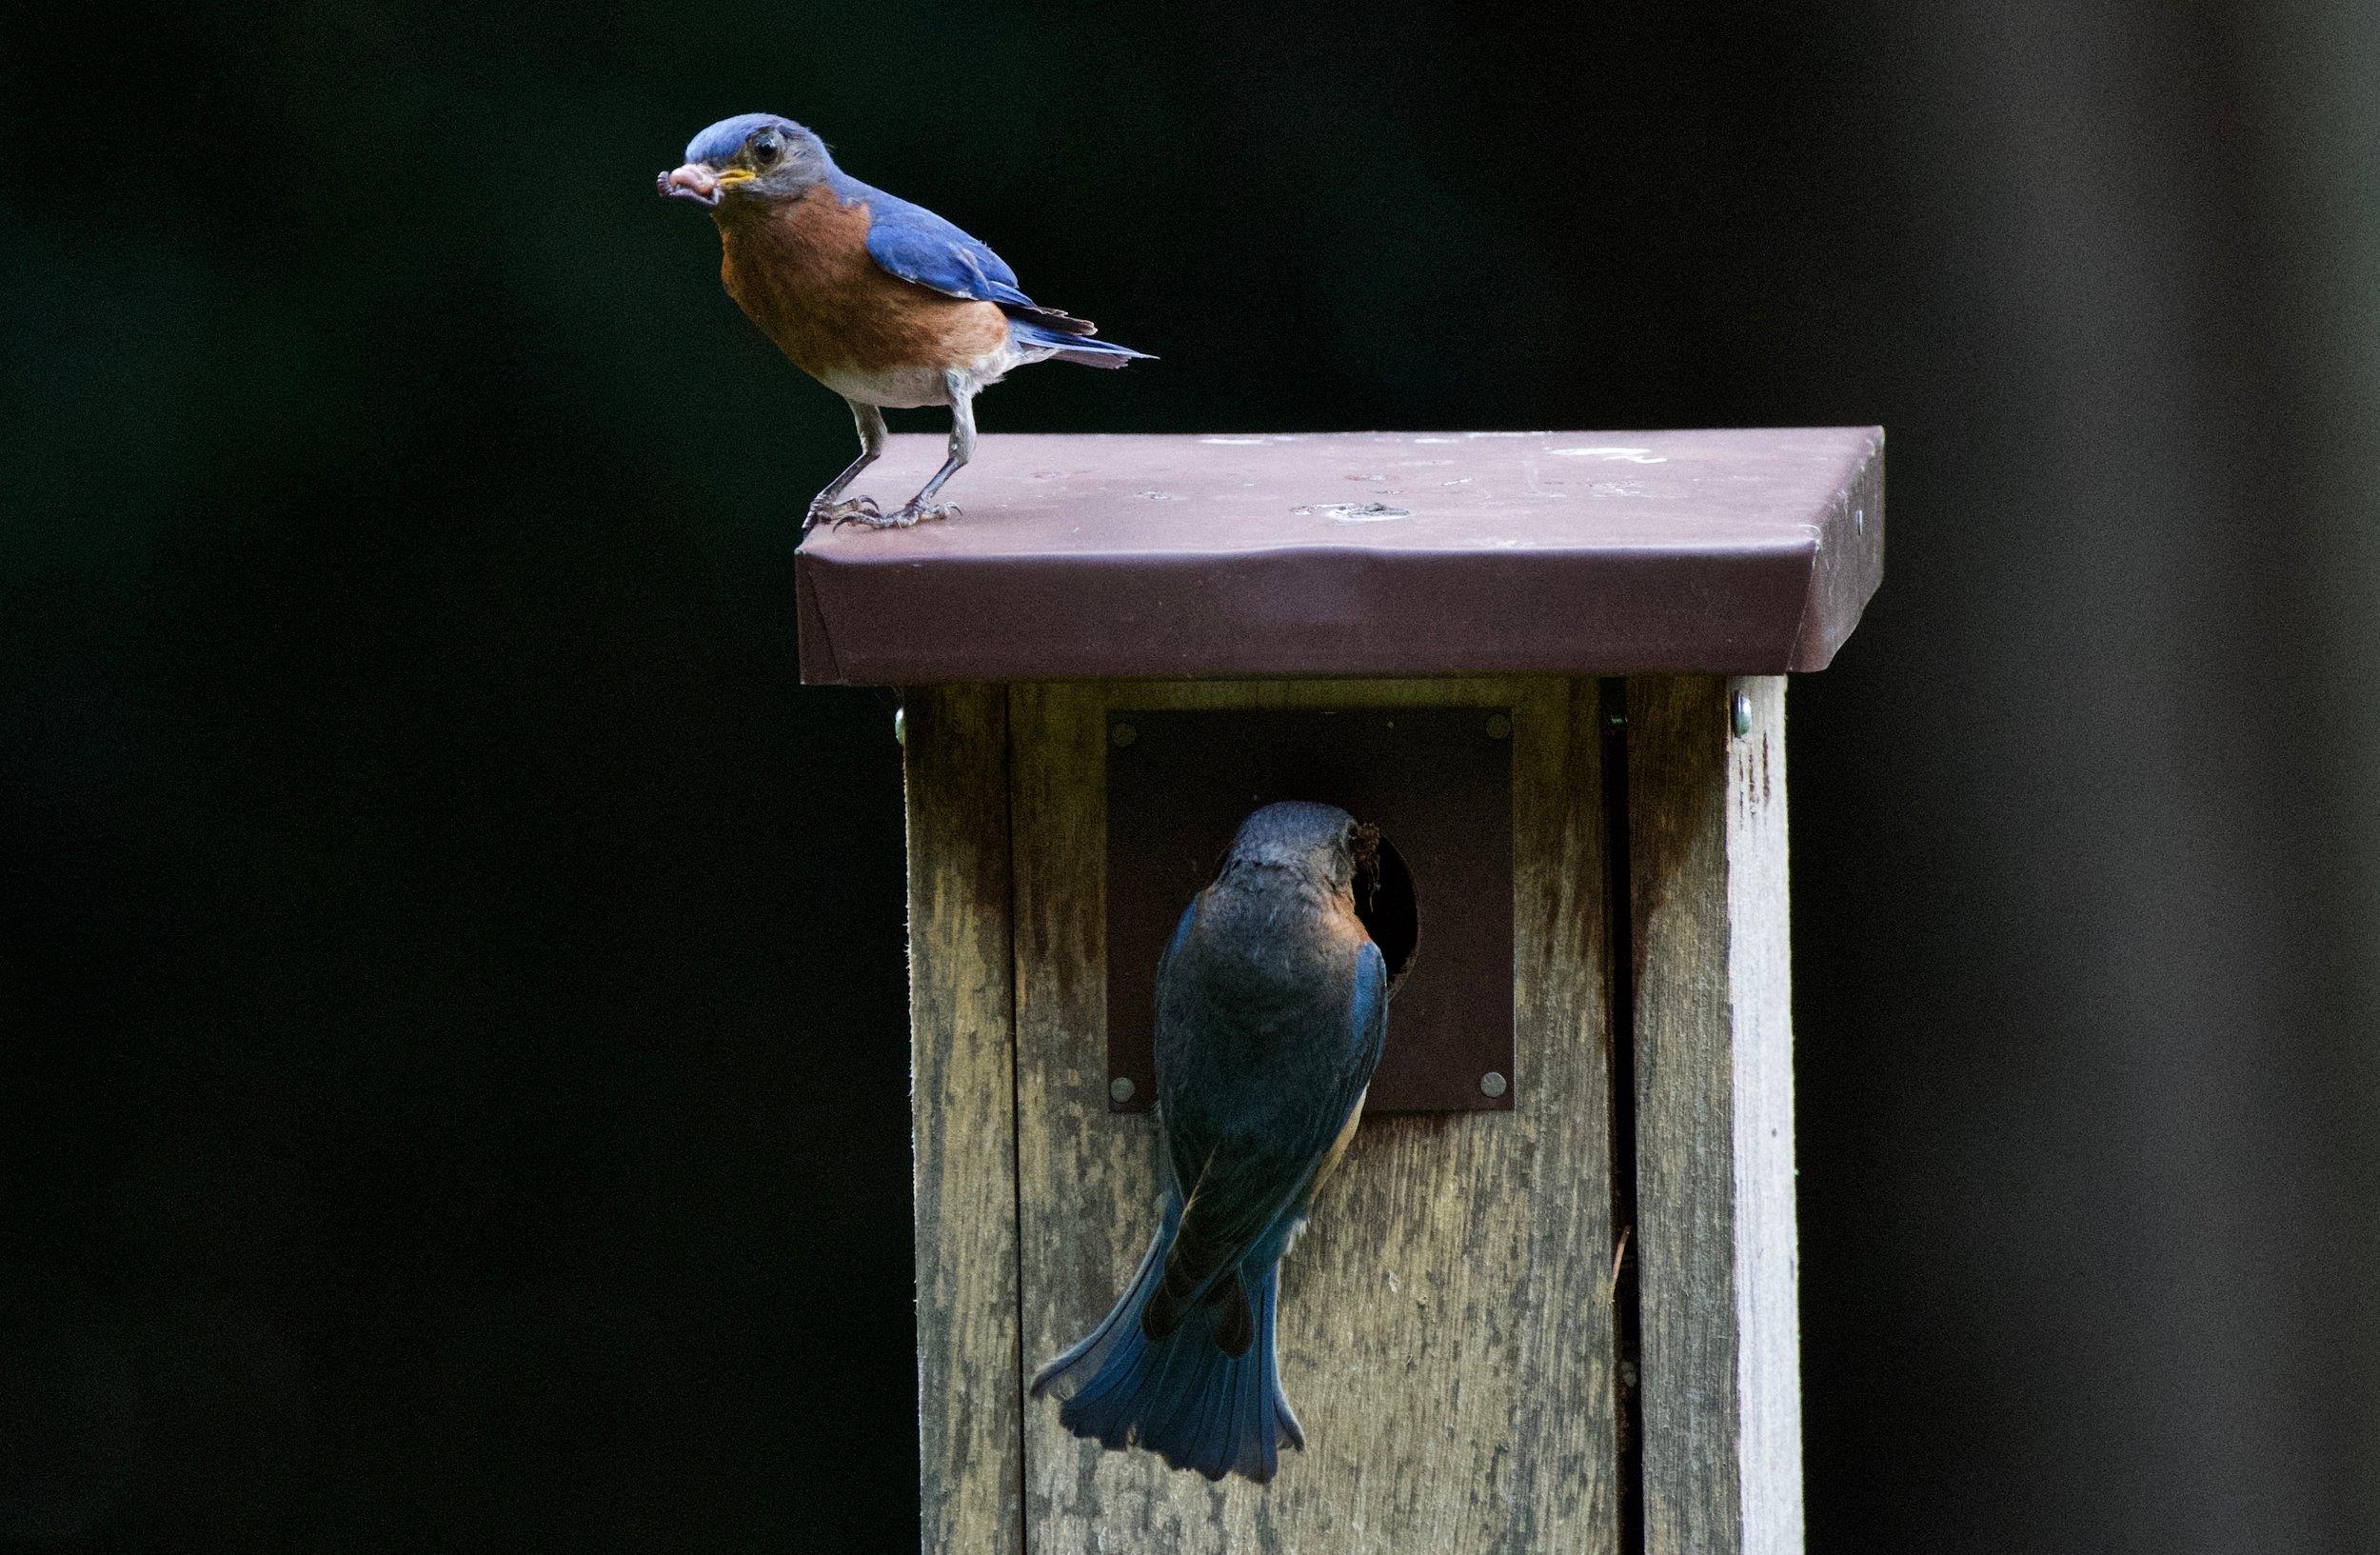 Eastern Bluebird-male and female-feeding chicks.jpg